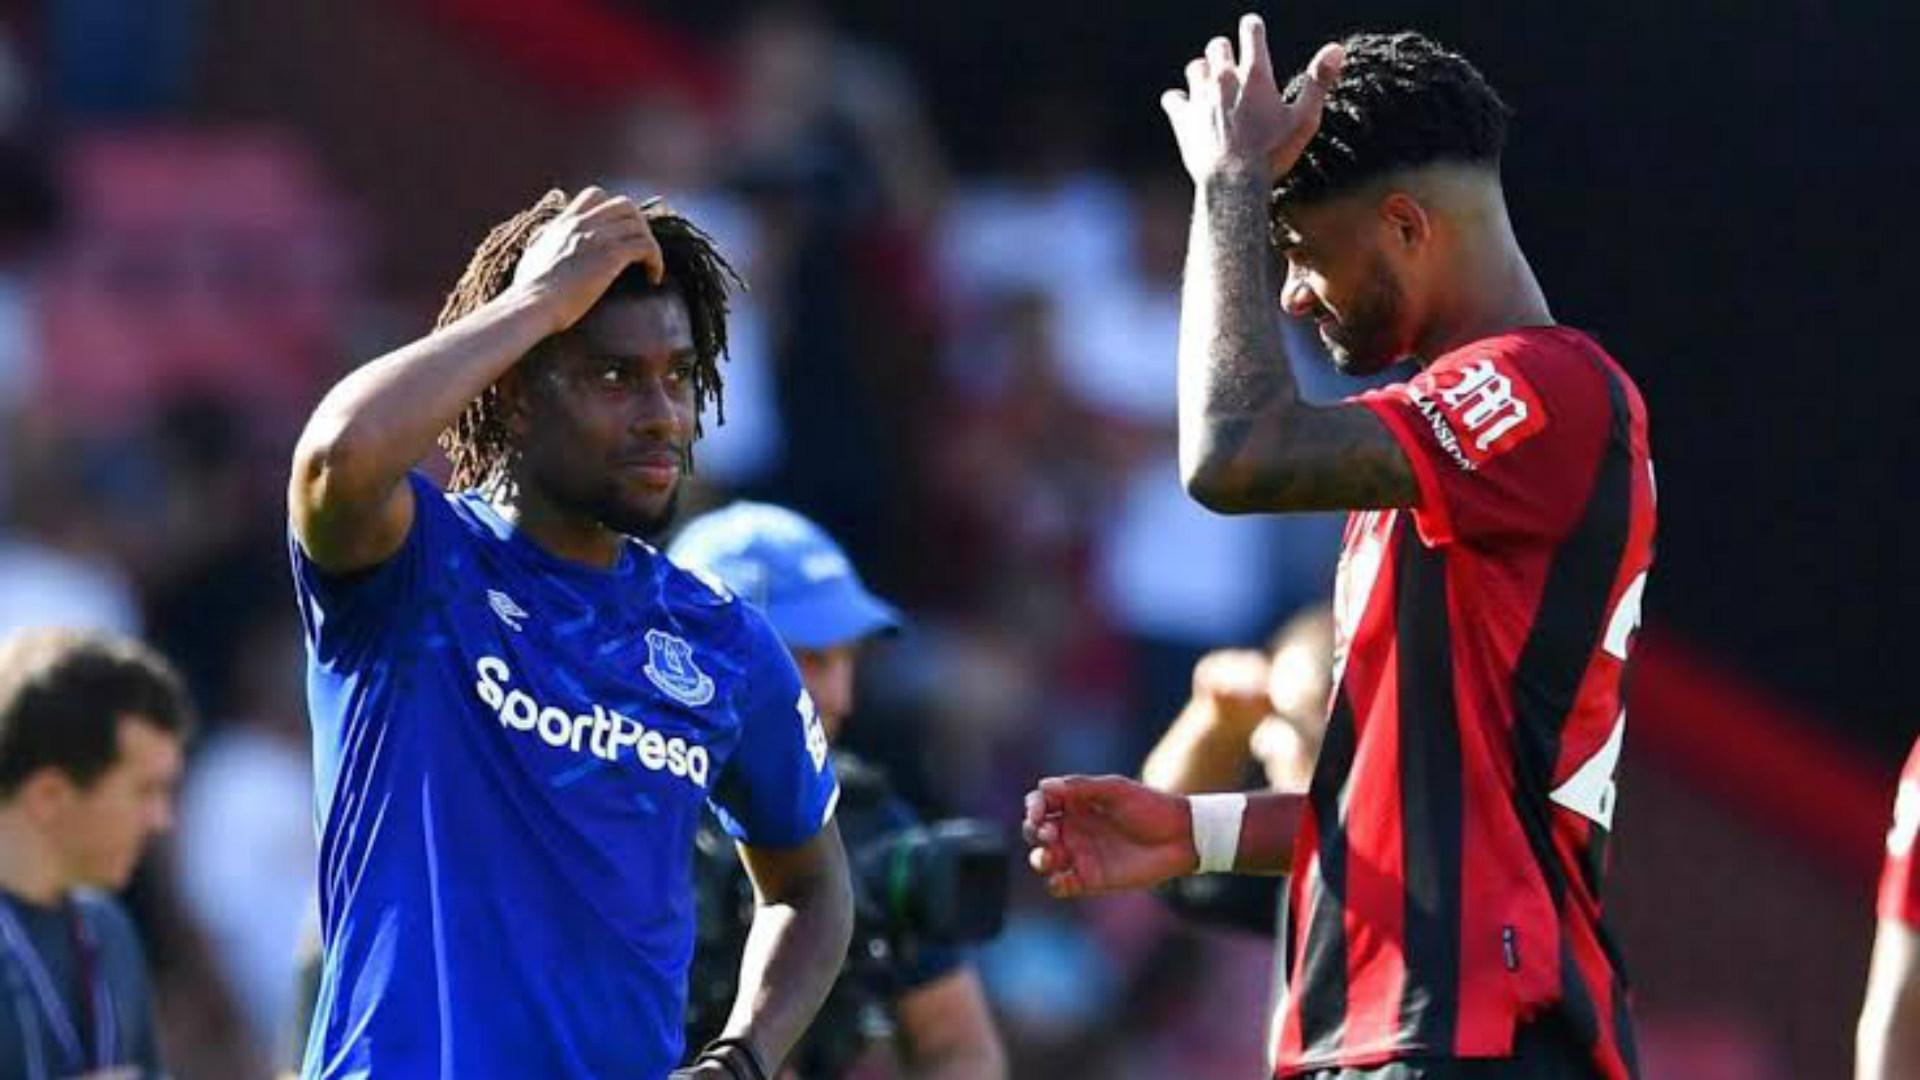 Everton's Alex Iwobi and Bournemouth's Philip Billing